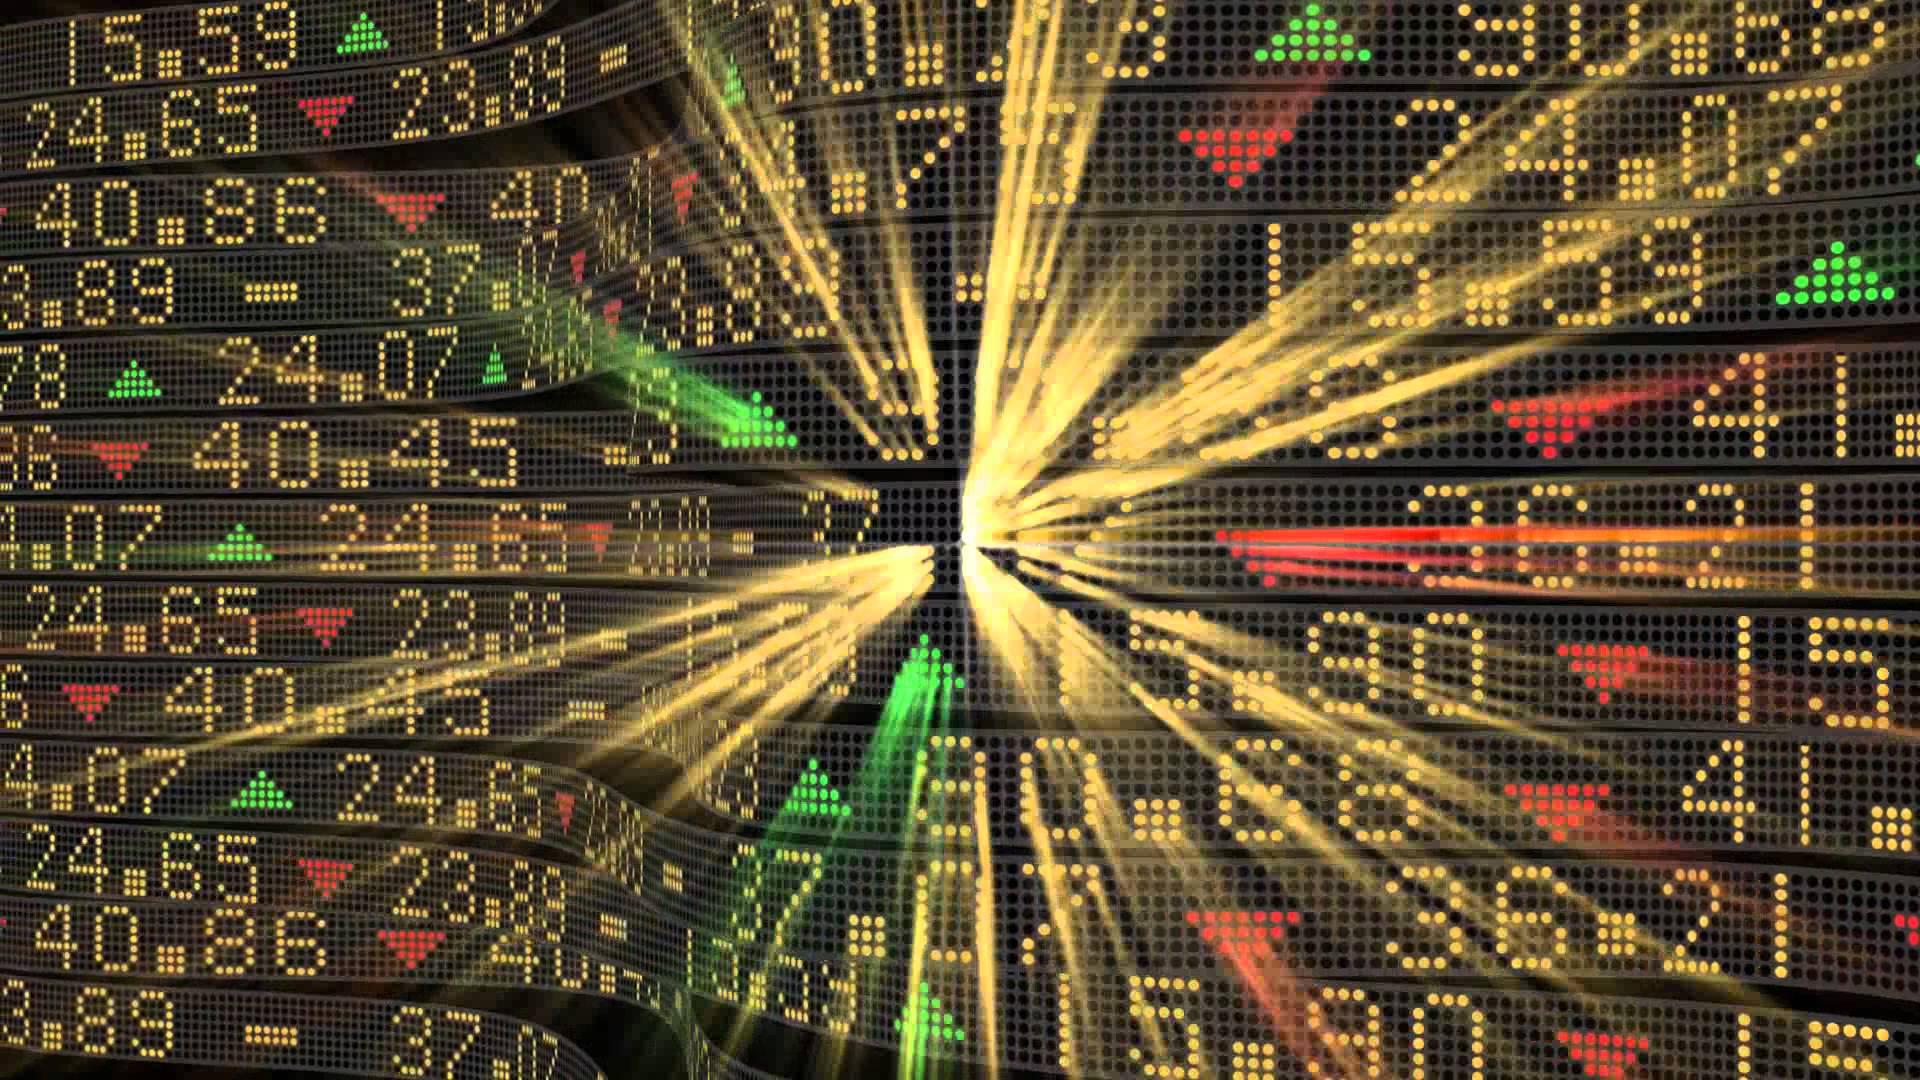 Crypto Wallpaper 3d Stock Market Wallpapers Wallpaper Cave